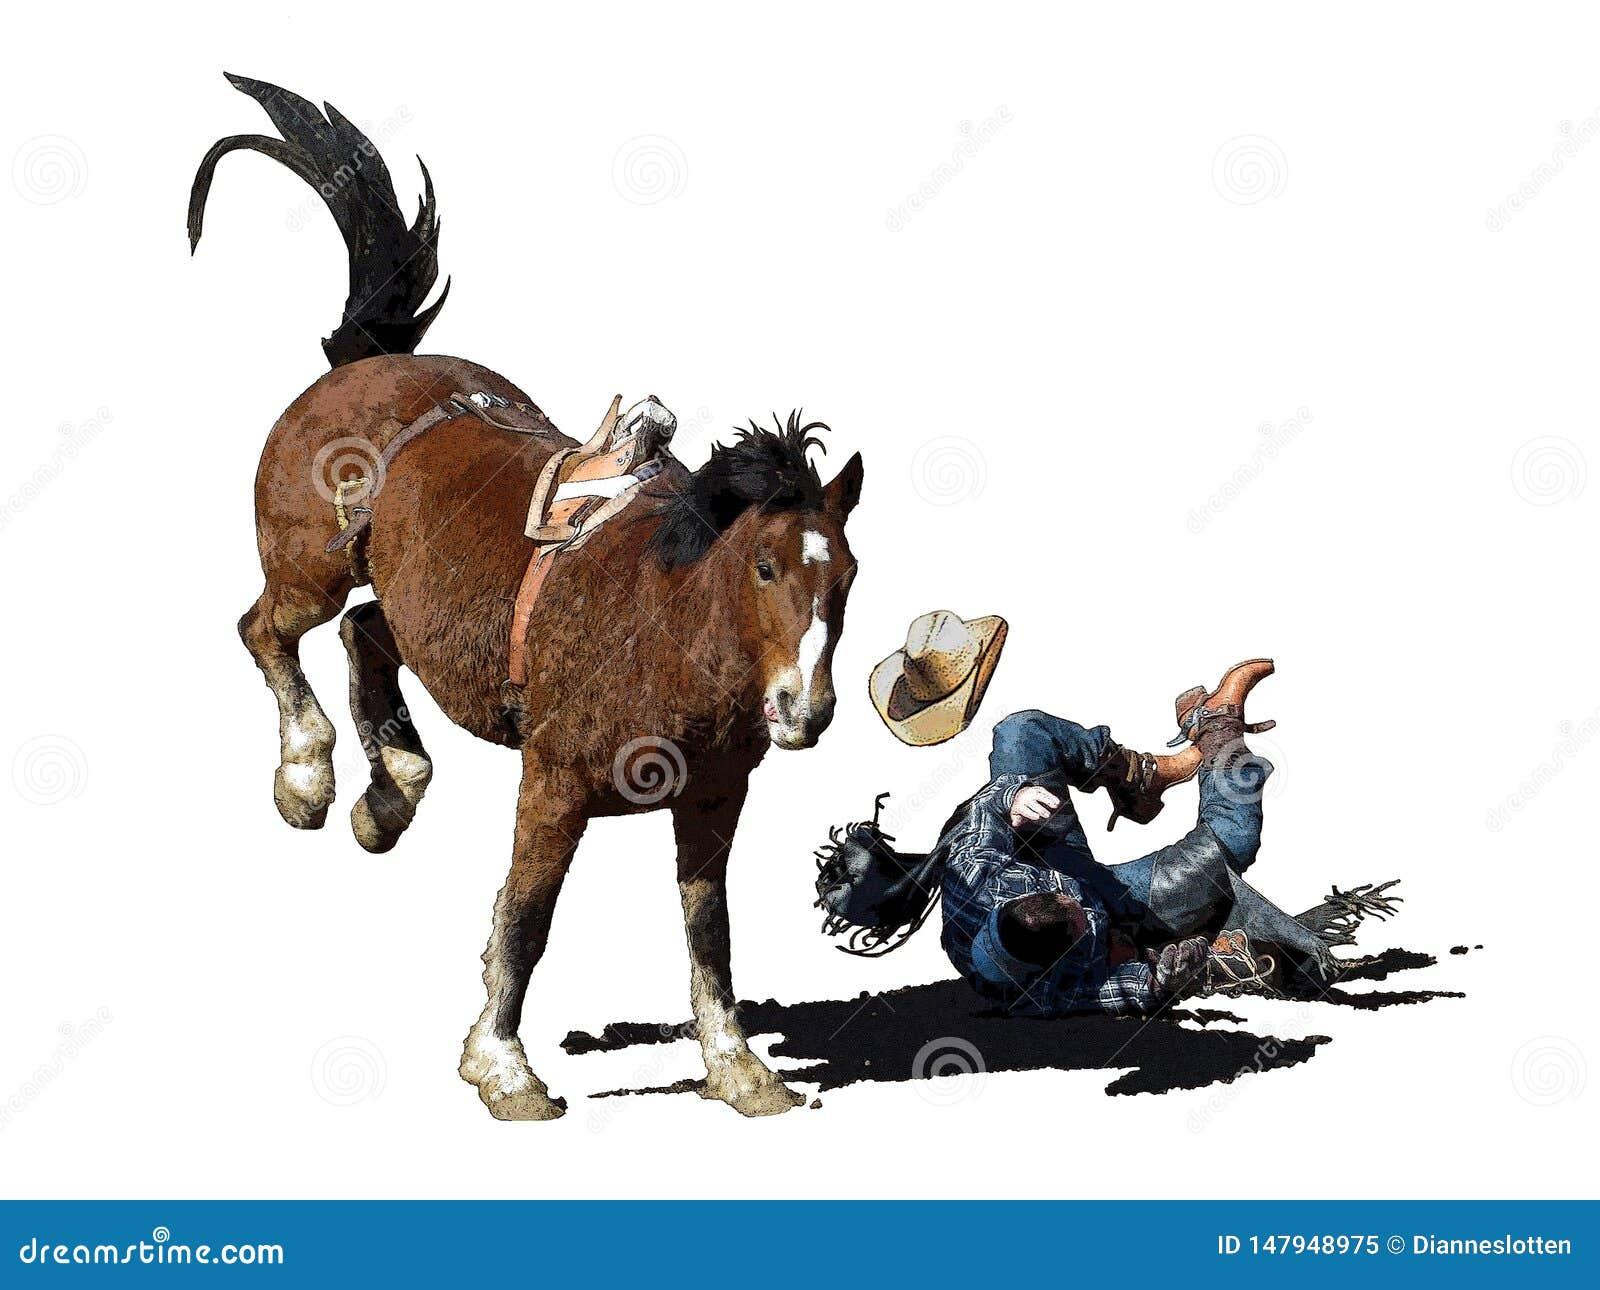 Falling Off Horse Stock Illustrations 6 Falling Off Horse Stock Illustrations Vectors Clipart Dreamstime